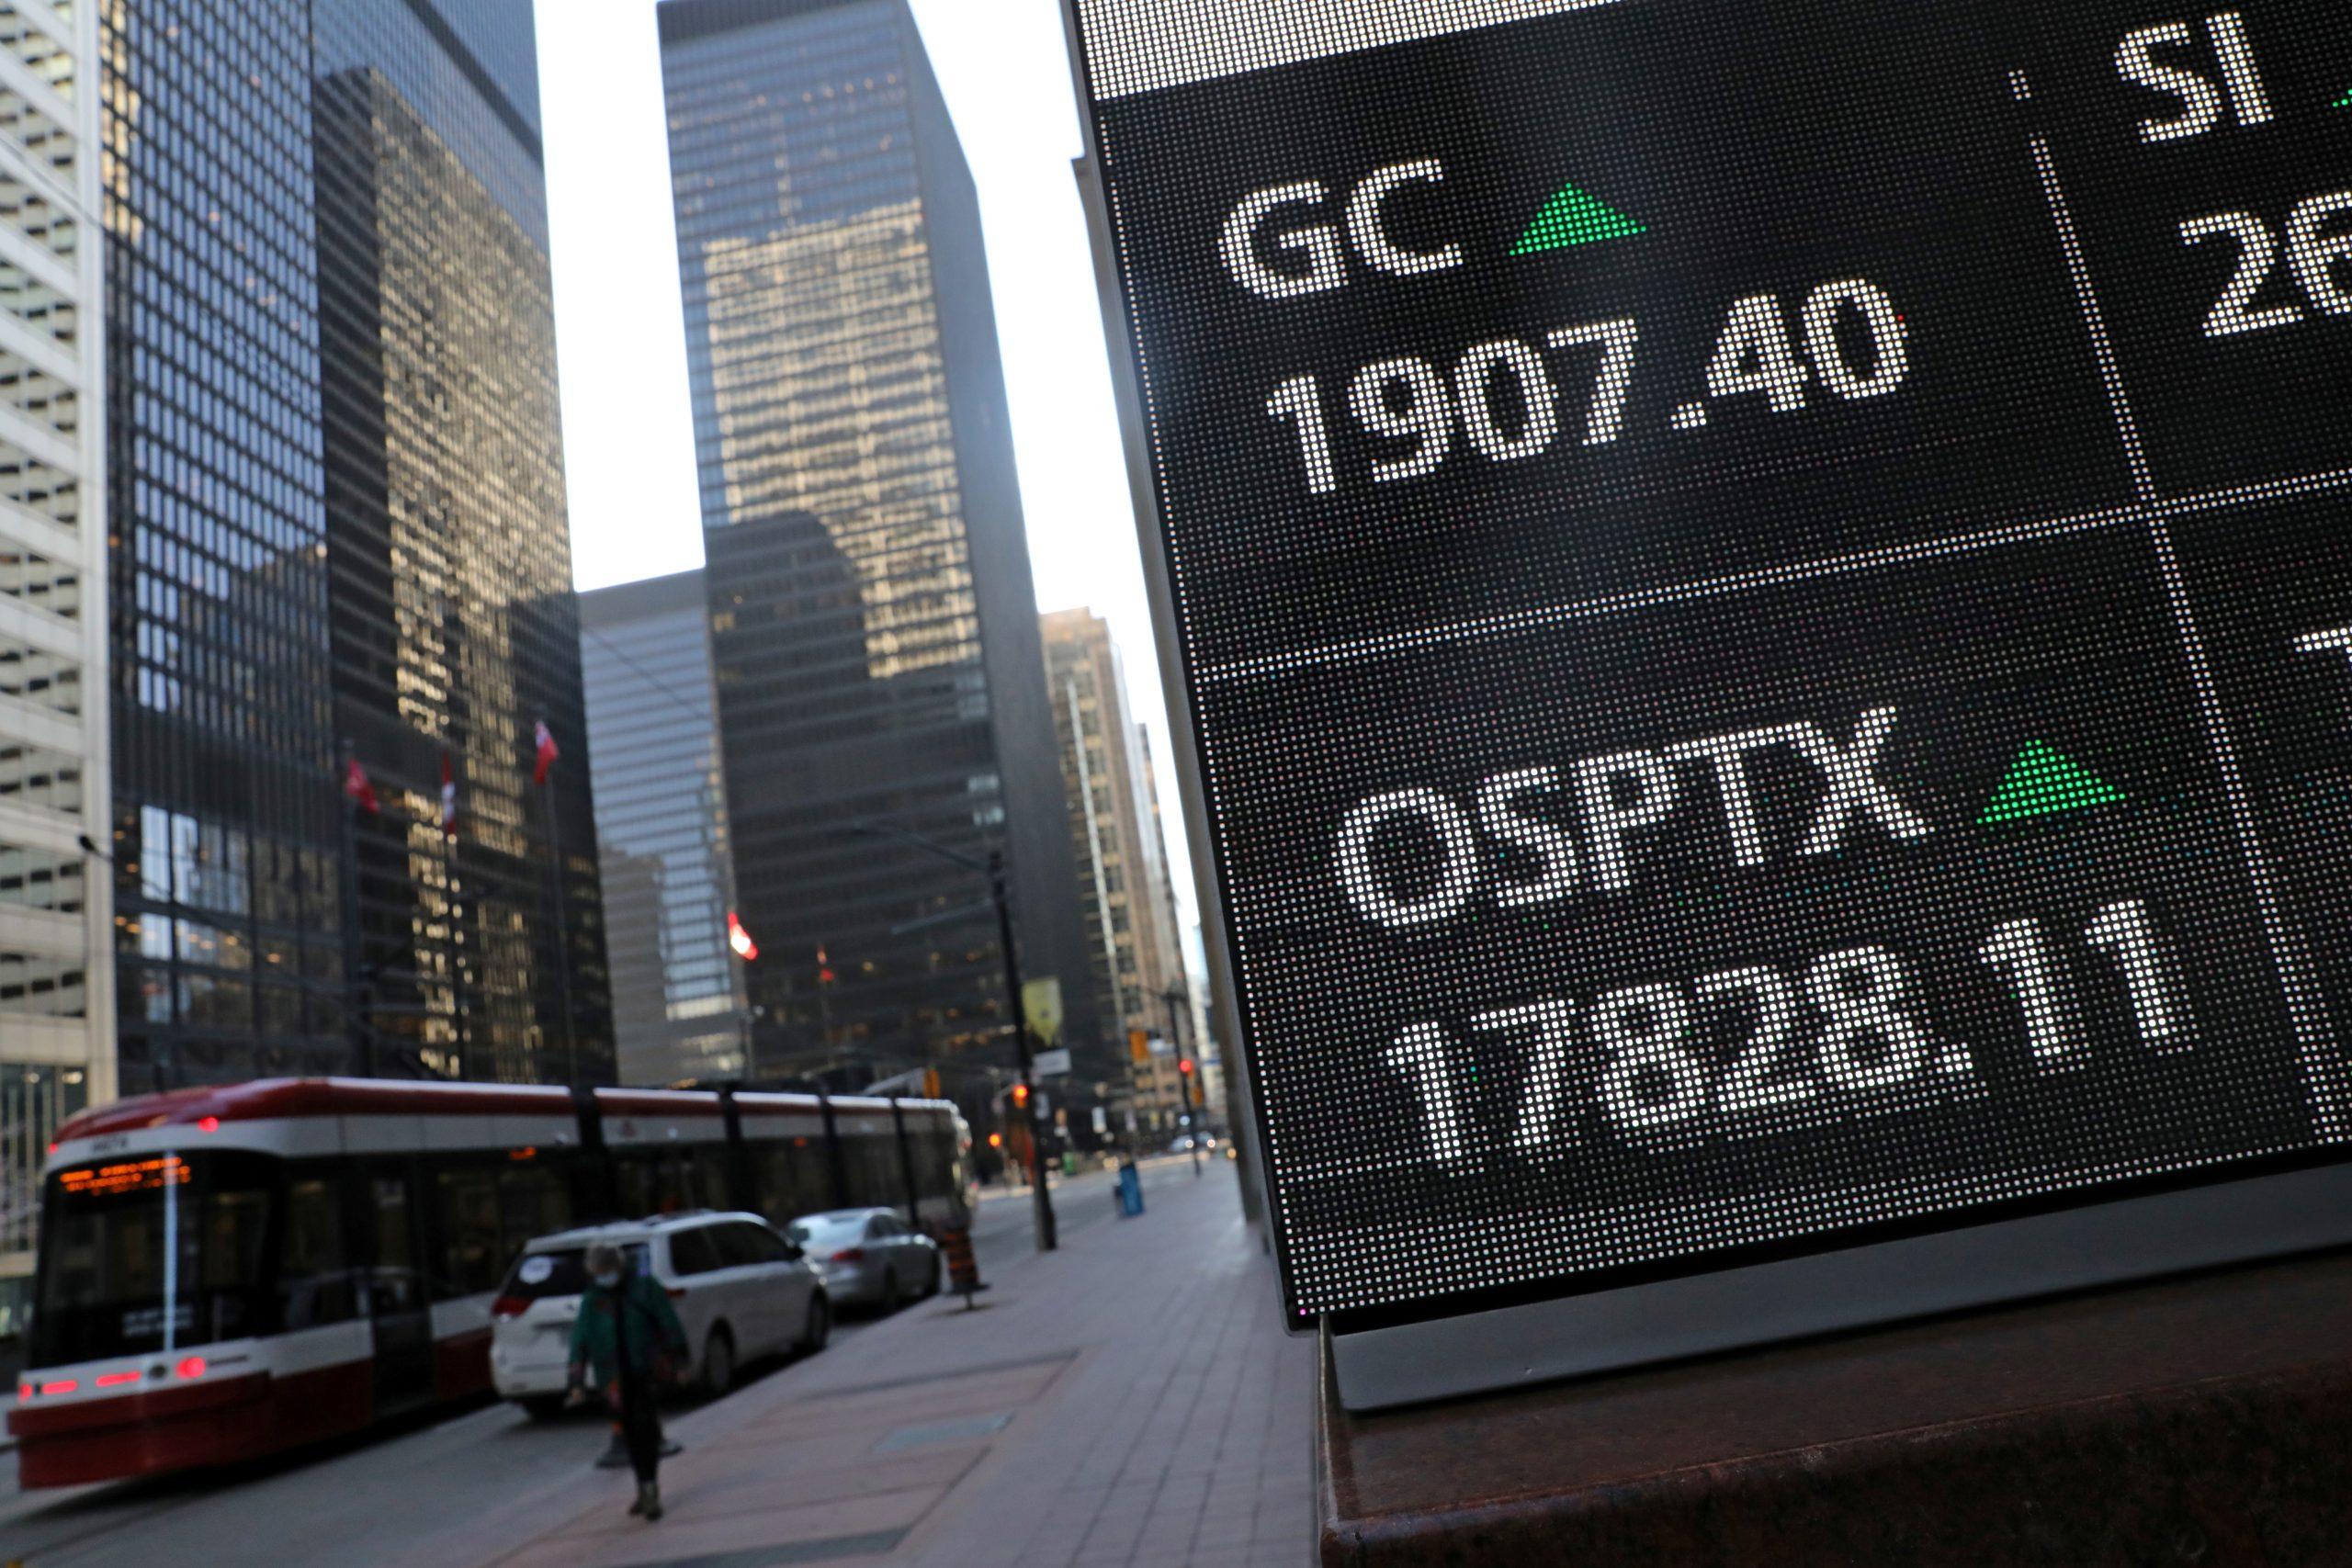 TSX futures down on weaker bullion prices; BoC decision awaited  | SaltWire